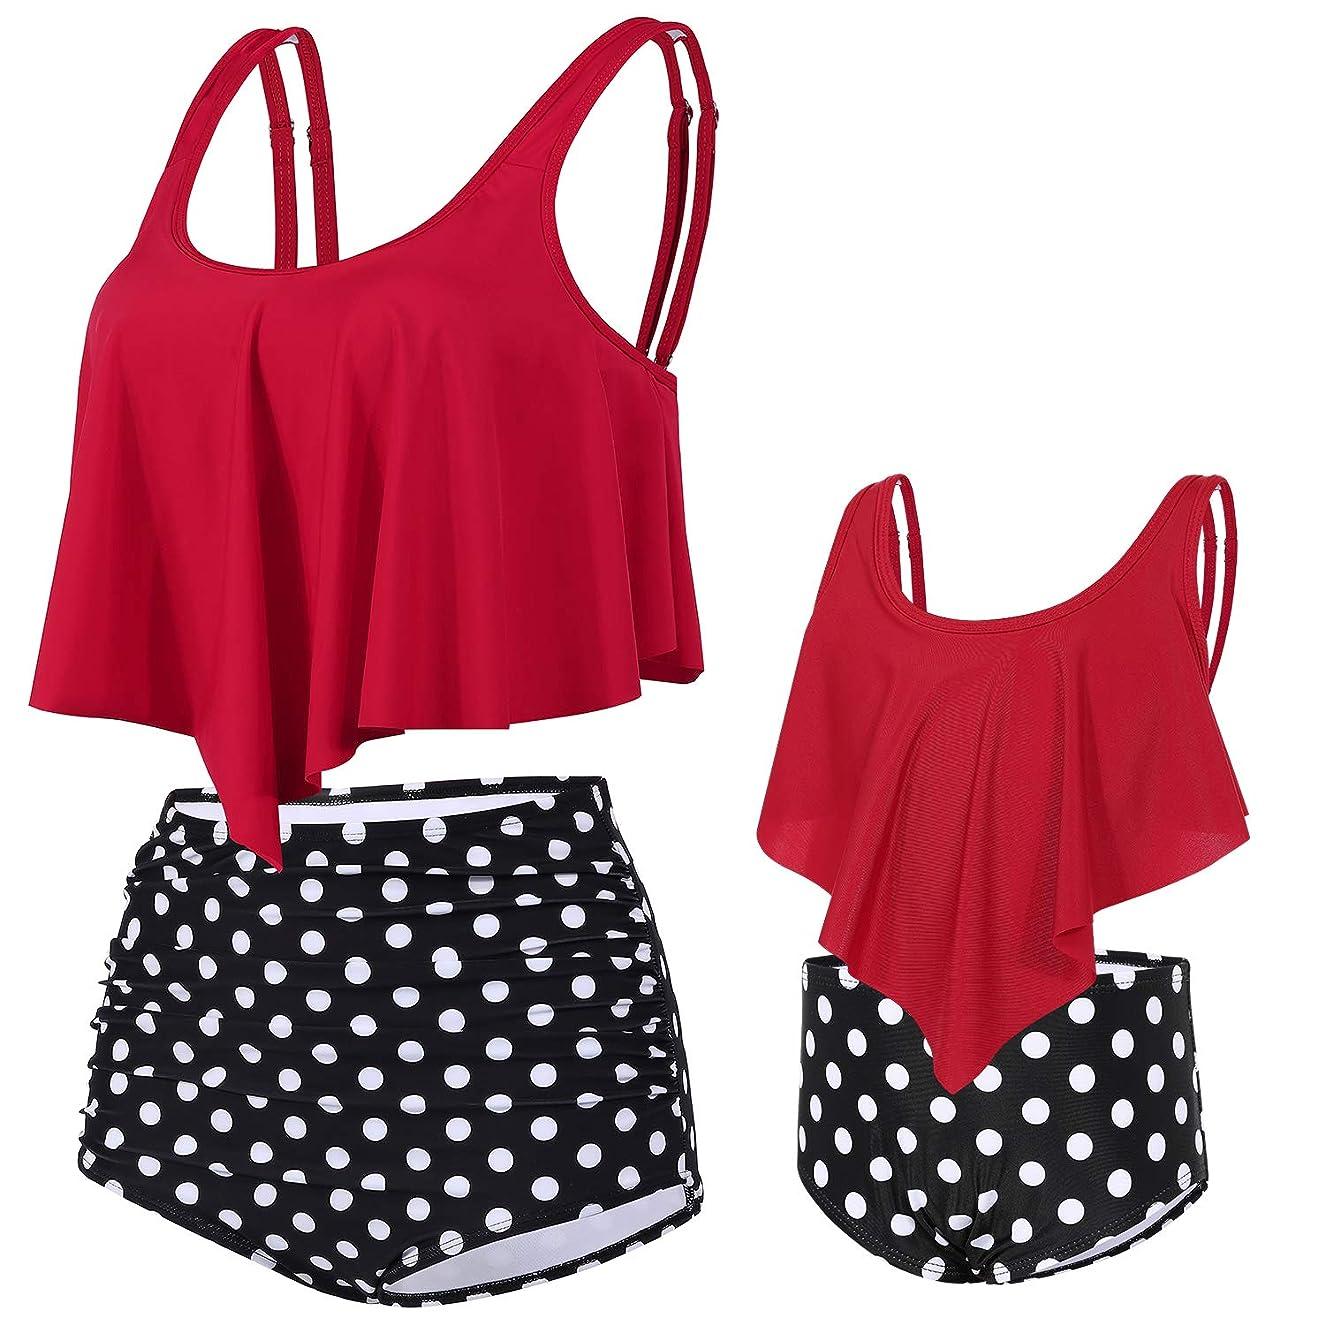 DINIGOFIN Girls Two Pieces Swimsuit Women Bikini Set Ruffle Bathing Suit Family Matching Swimwear for Mother and Daughter